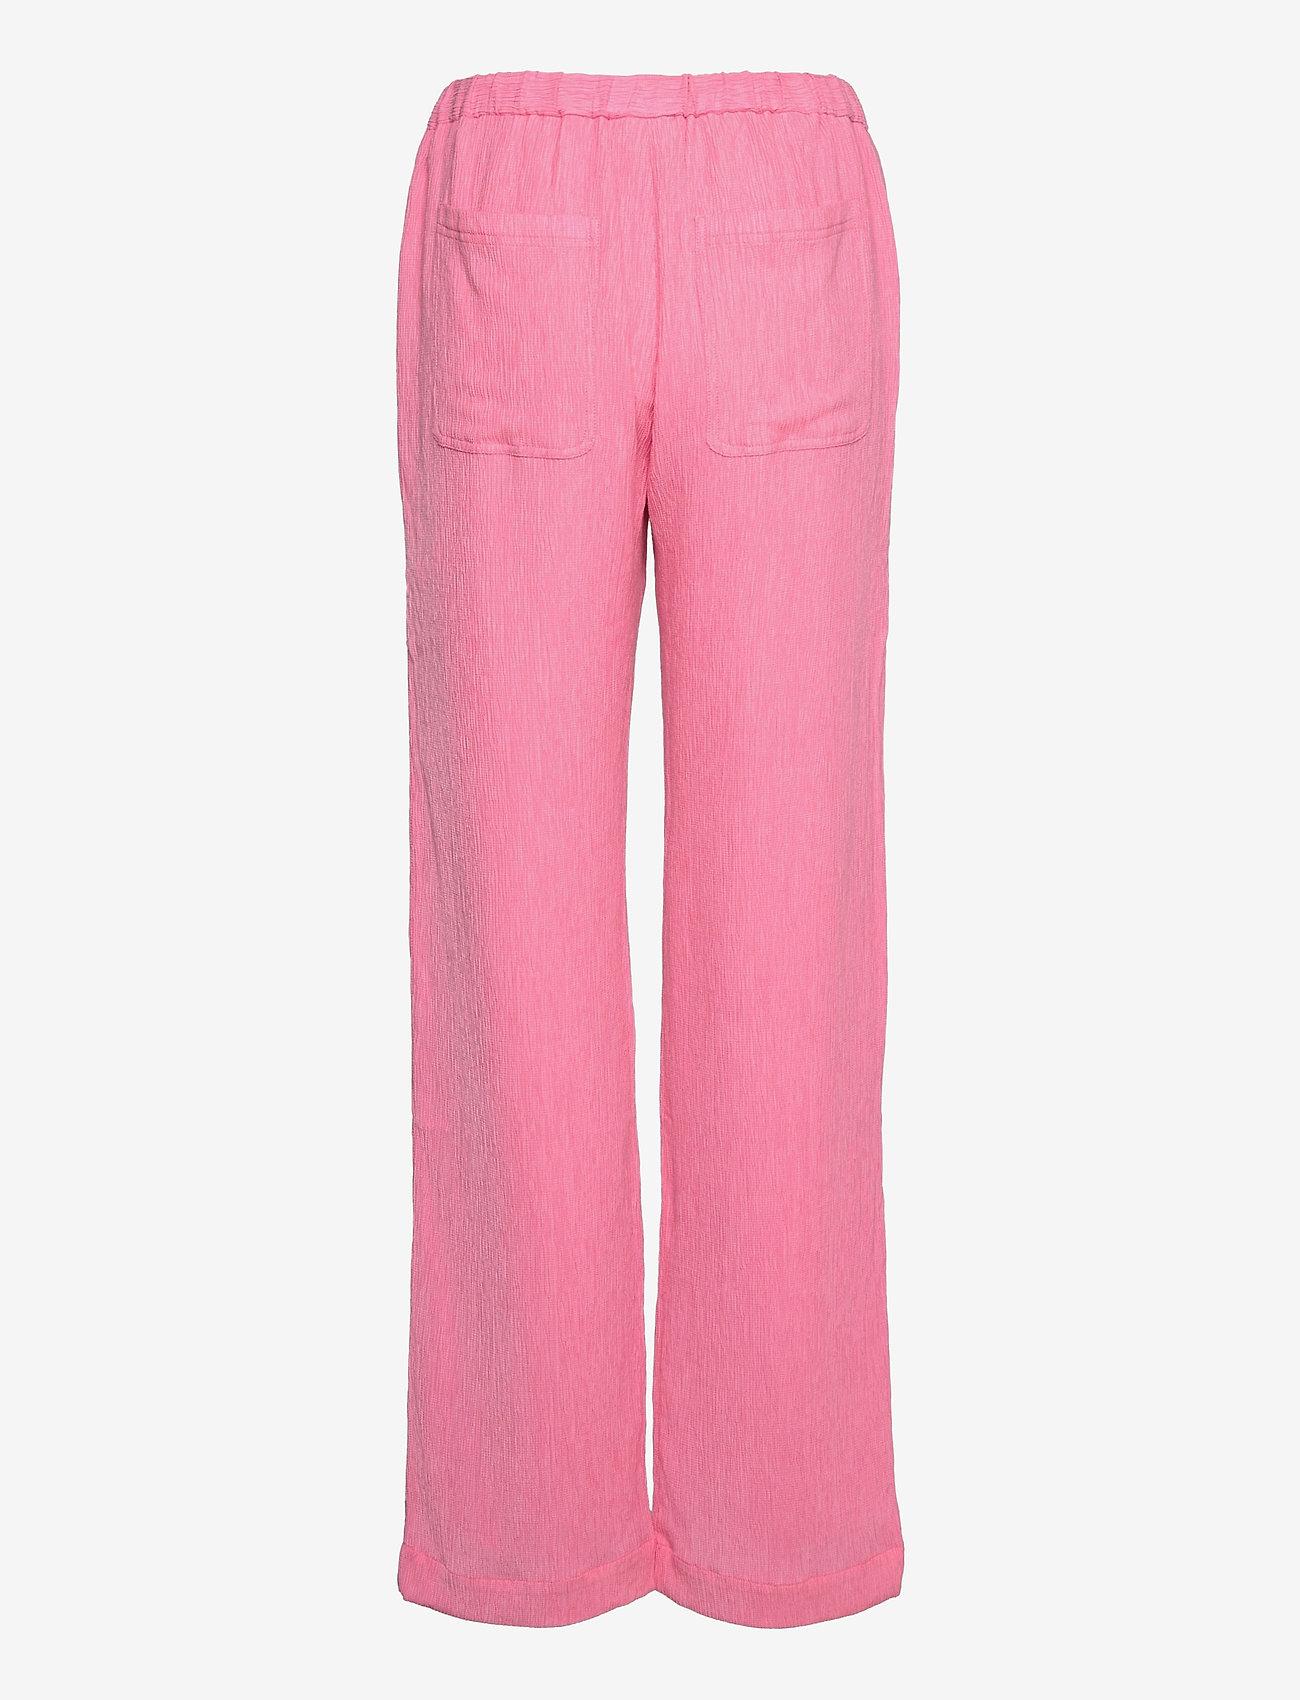 STINE GOYA - Gulcan, 1213 Crinkled Tencel - casual bukser - pink - 1